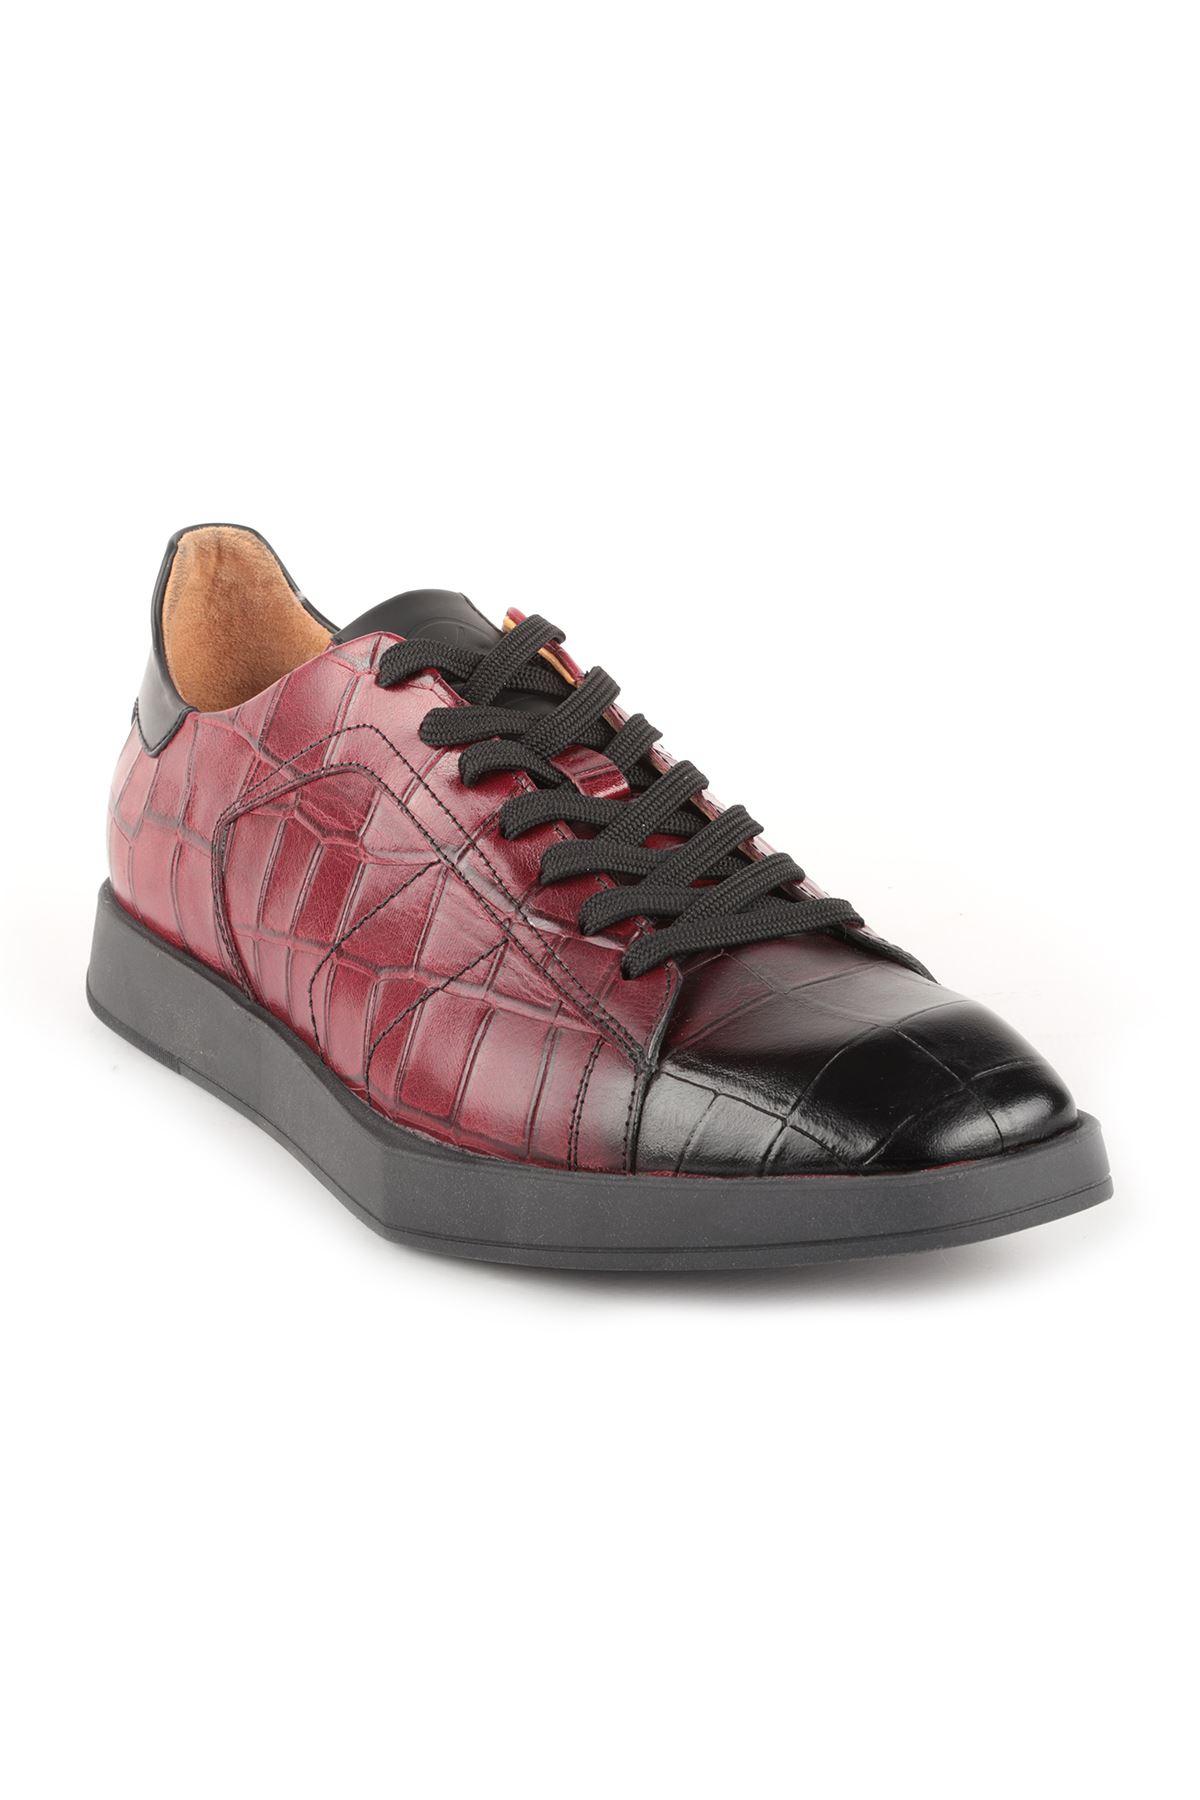 Libero L3805 Claret Red Men Shoes